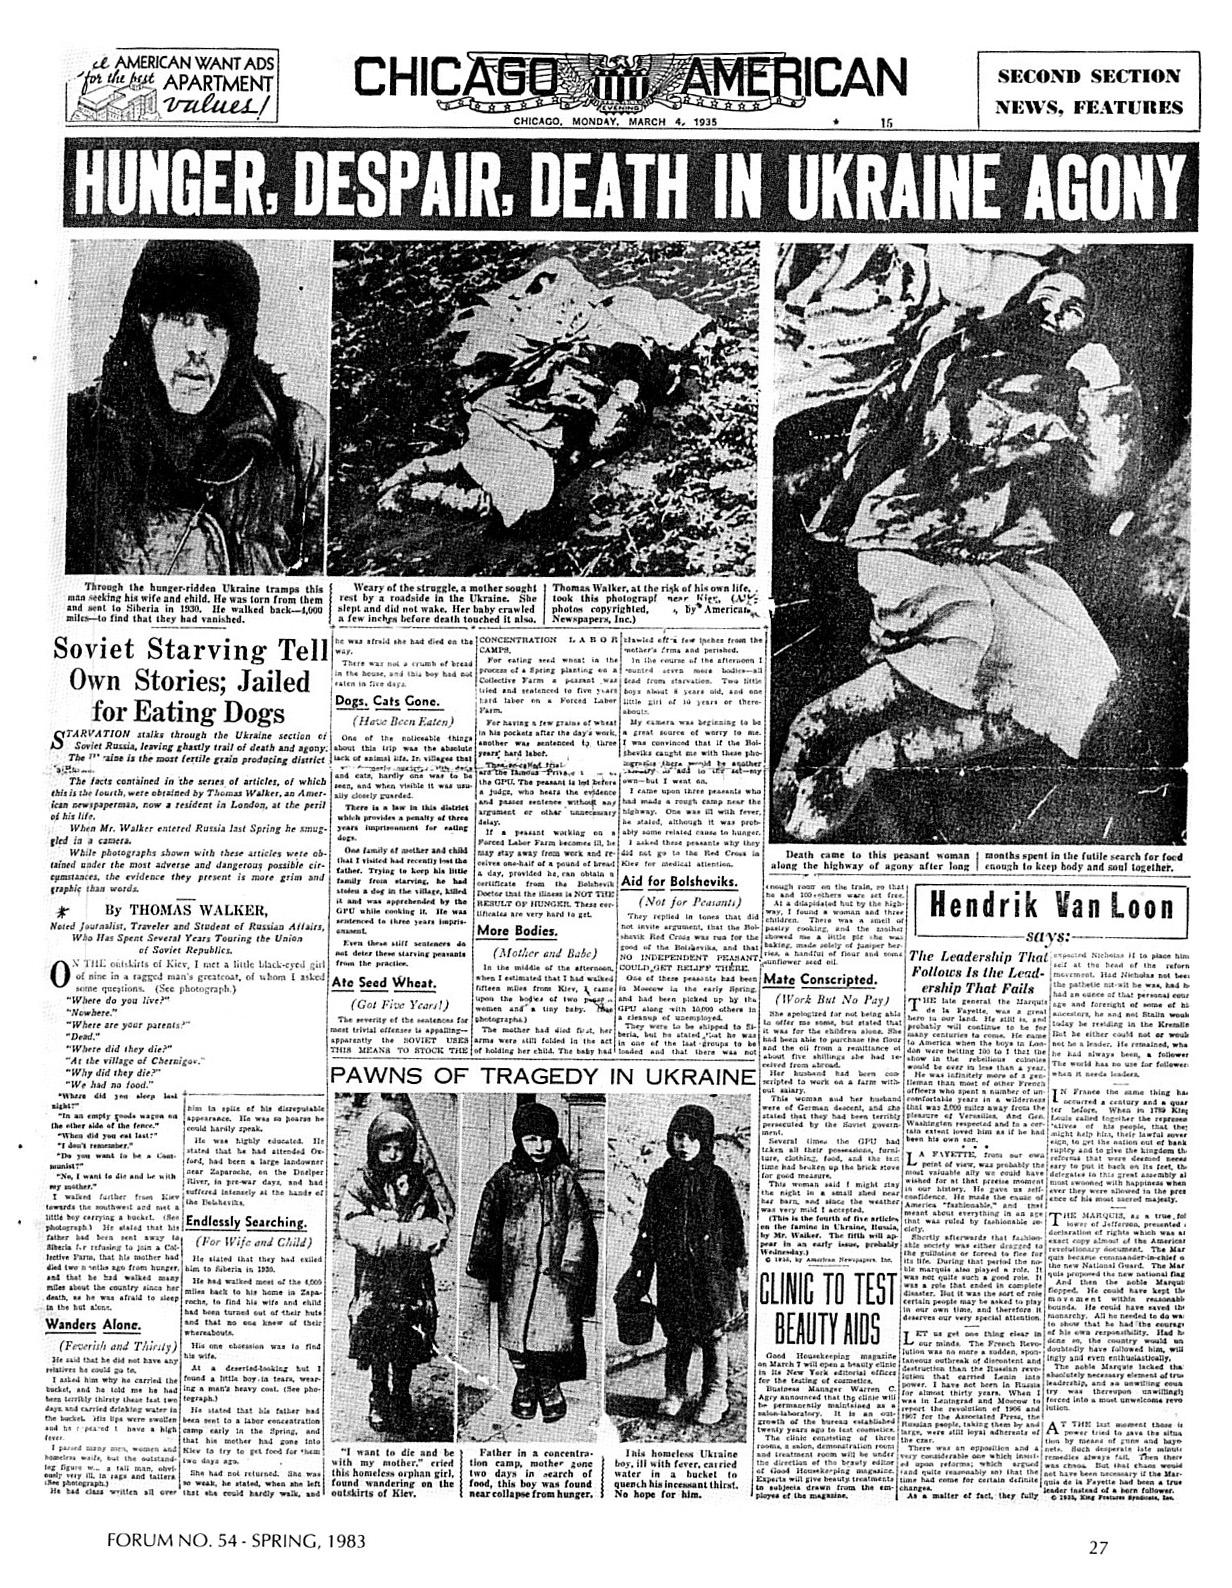 the ukrainian famine genocide Bibliography surviving  ukrainian genocide famine foundaiton - usa - history of the ukrainian genocide famine of 1932-1933 ukrainian genocide famine.